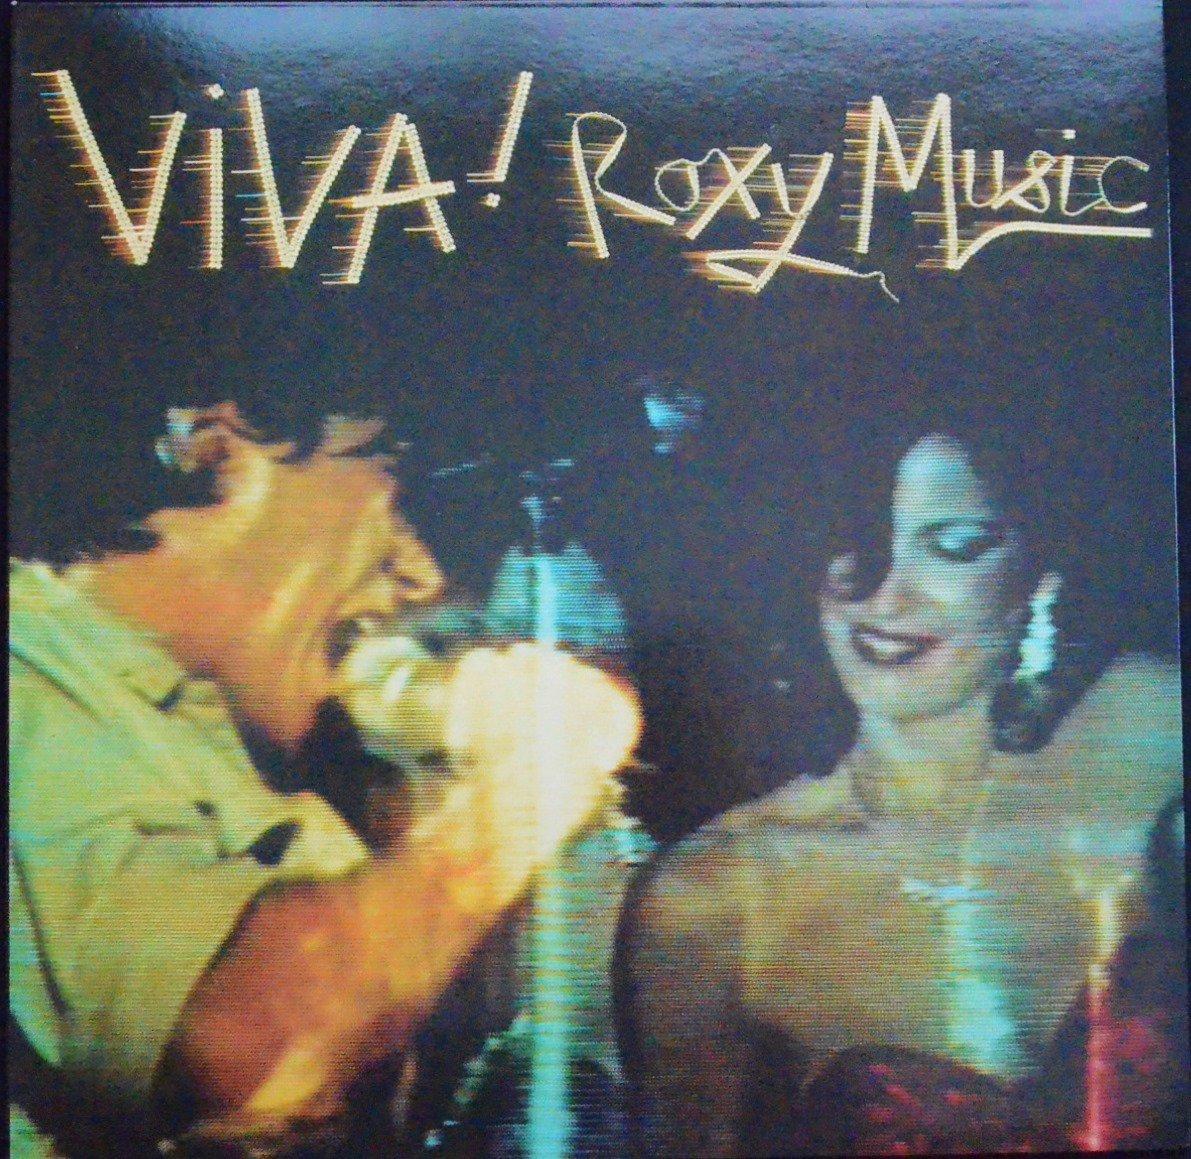 ROXY MUSIC / VIVA! ROXY MUSIC (THE LIVE ROXY MUSIC ALBUM) (LP)